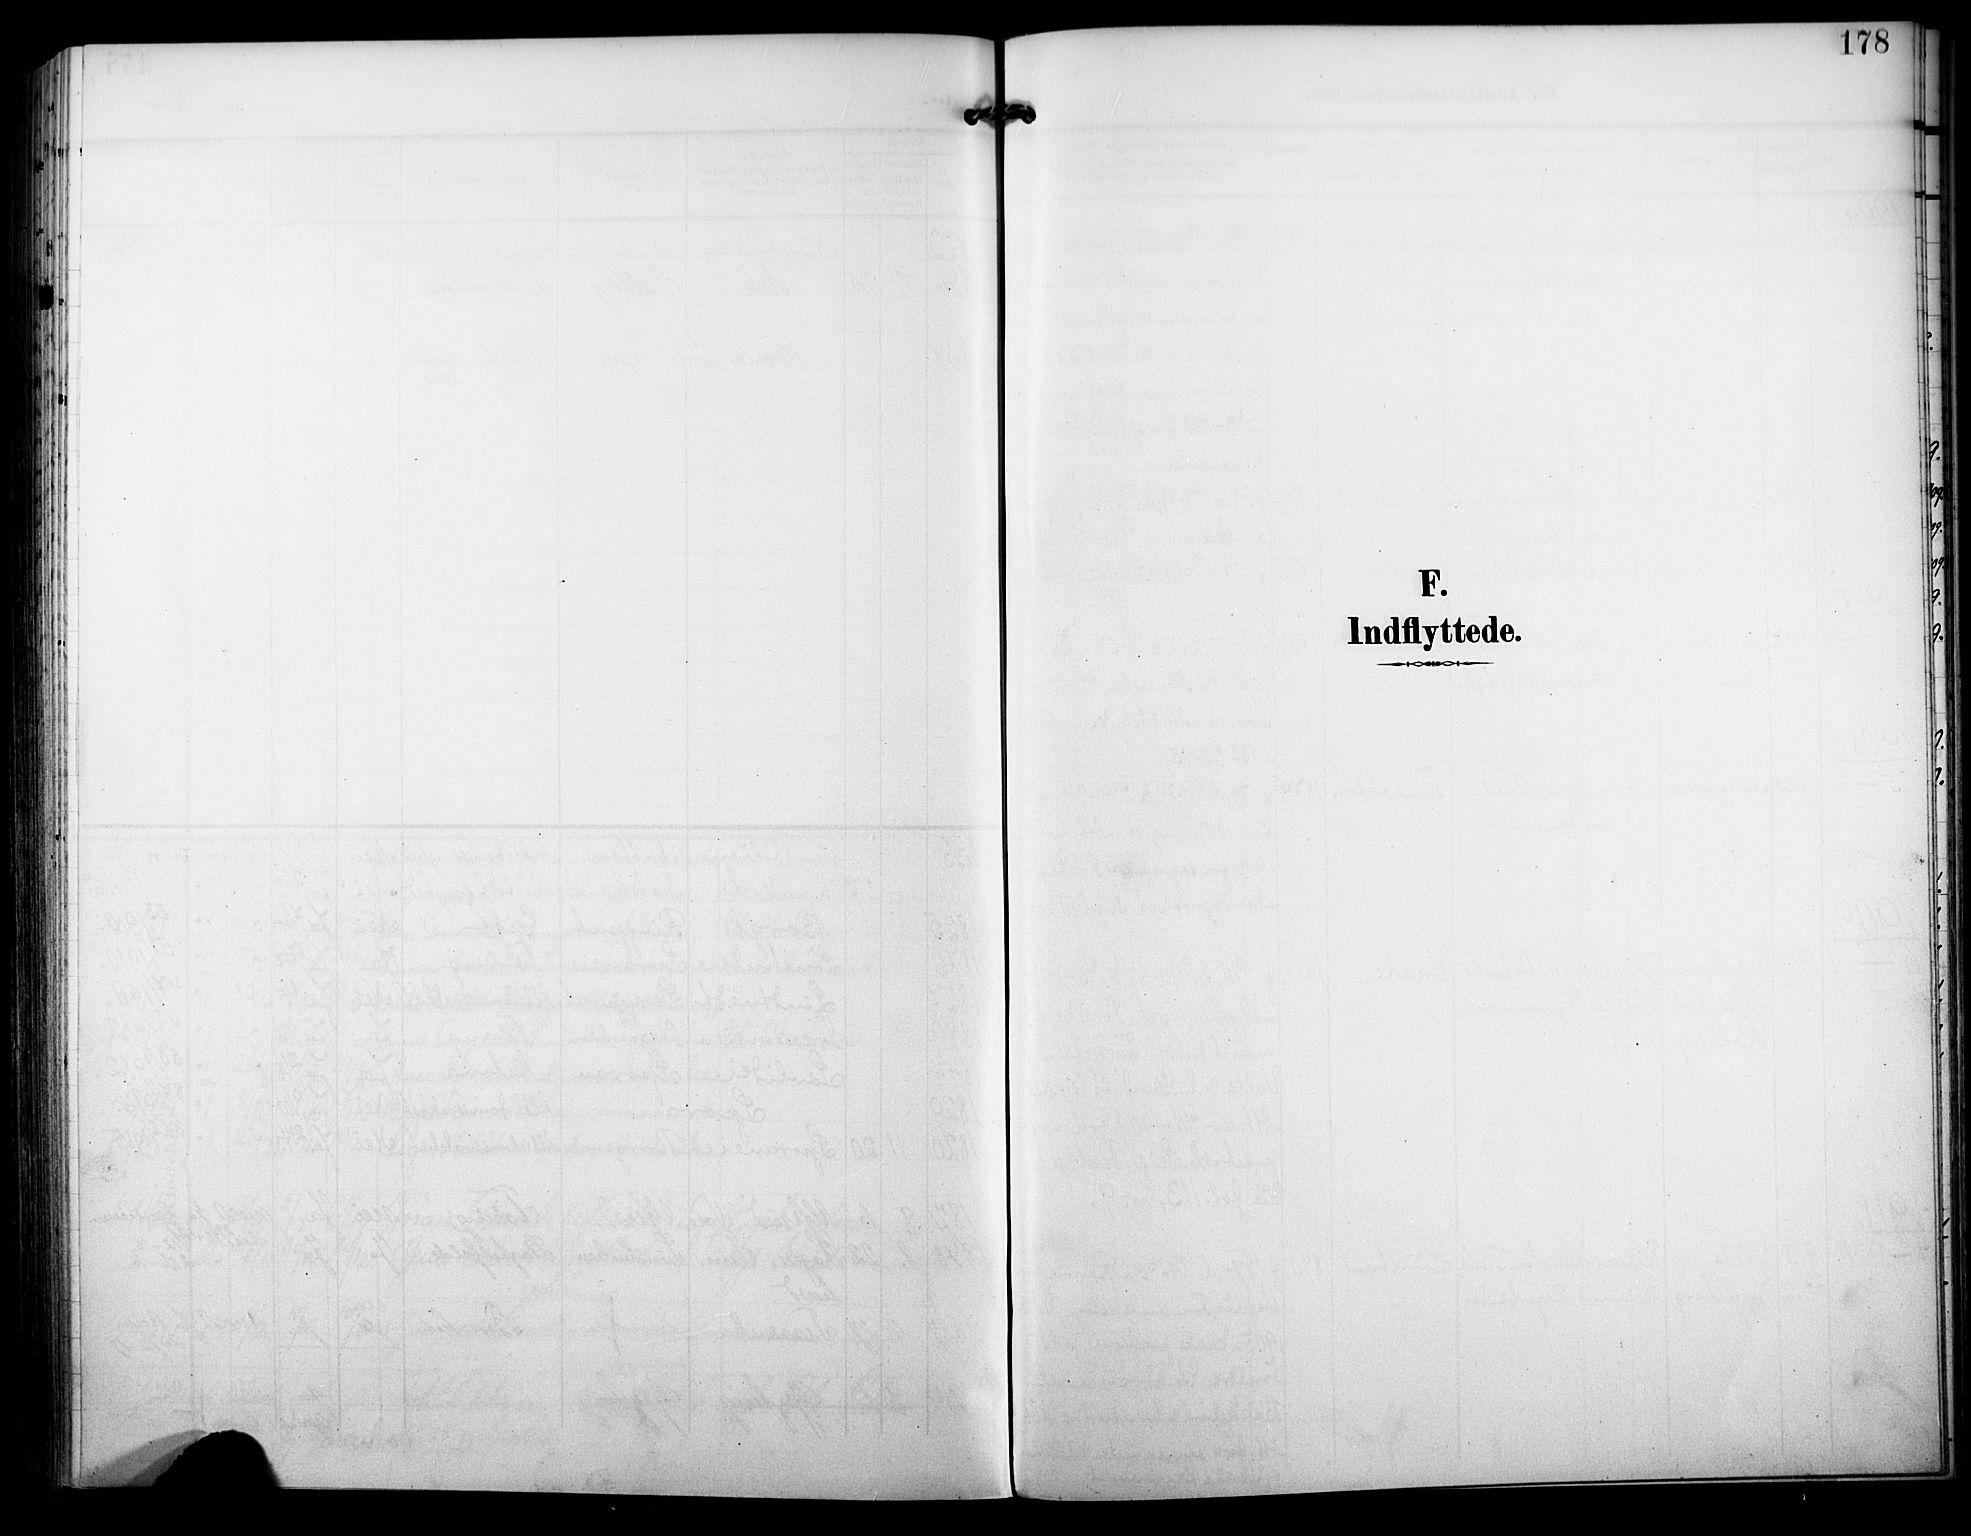 SAKO, Nore kirkebøker, F/Fb/L0003: Ministerialbok nr. II 3, 1906-1926, s. 178